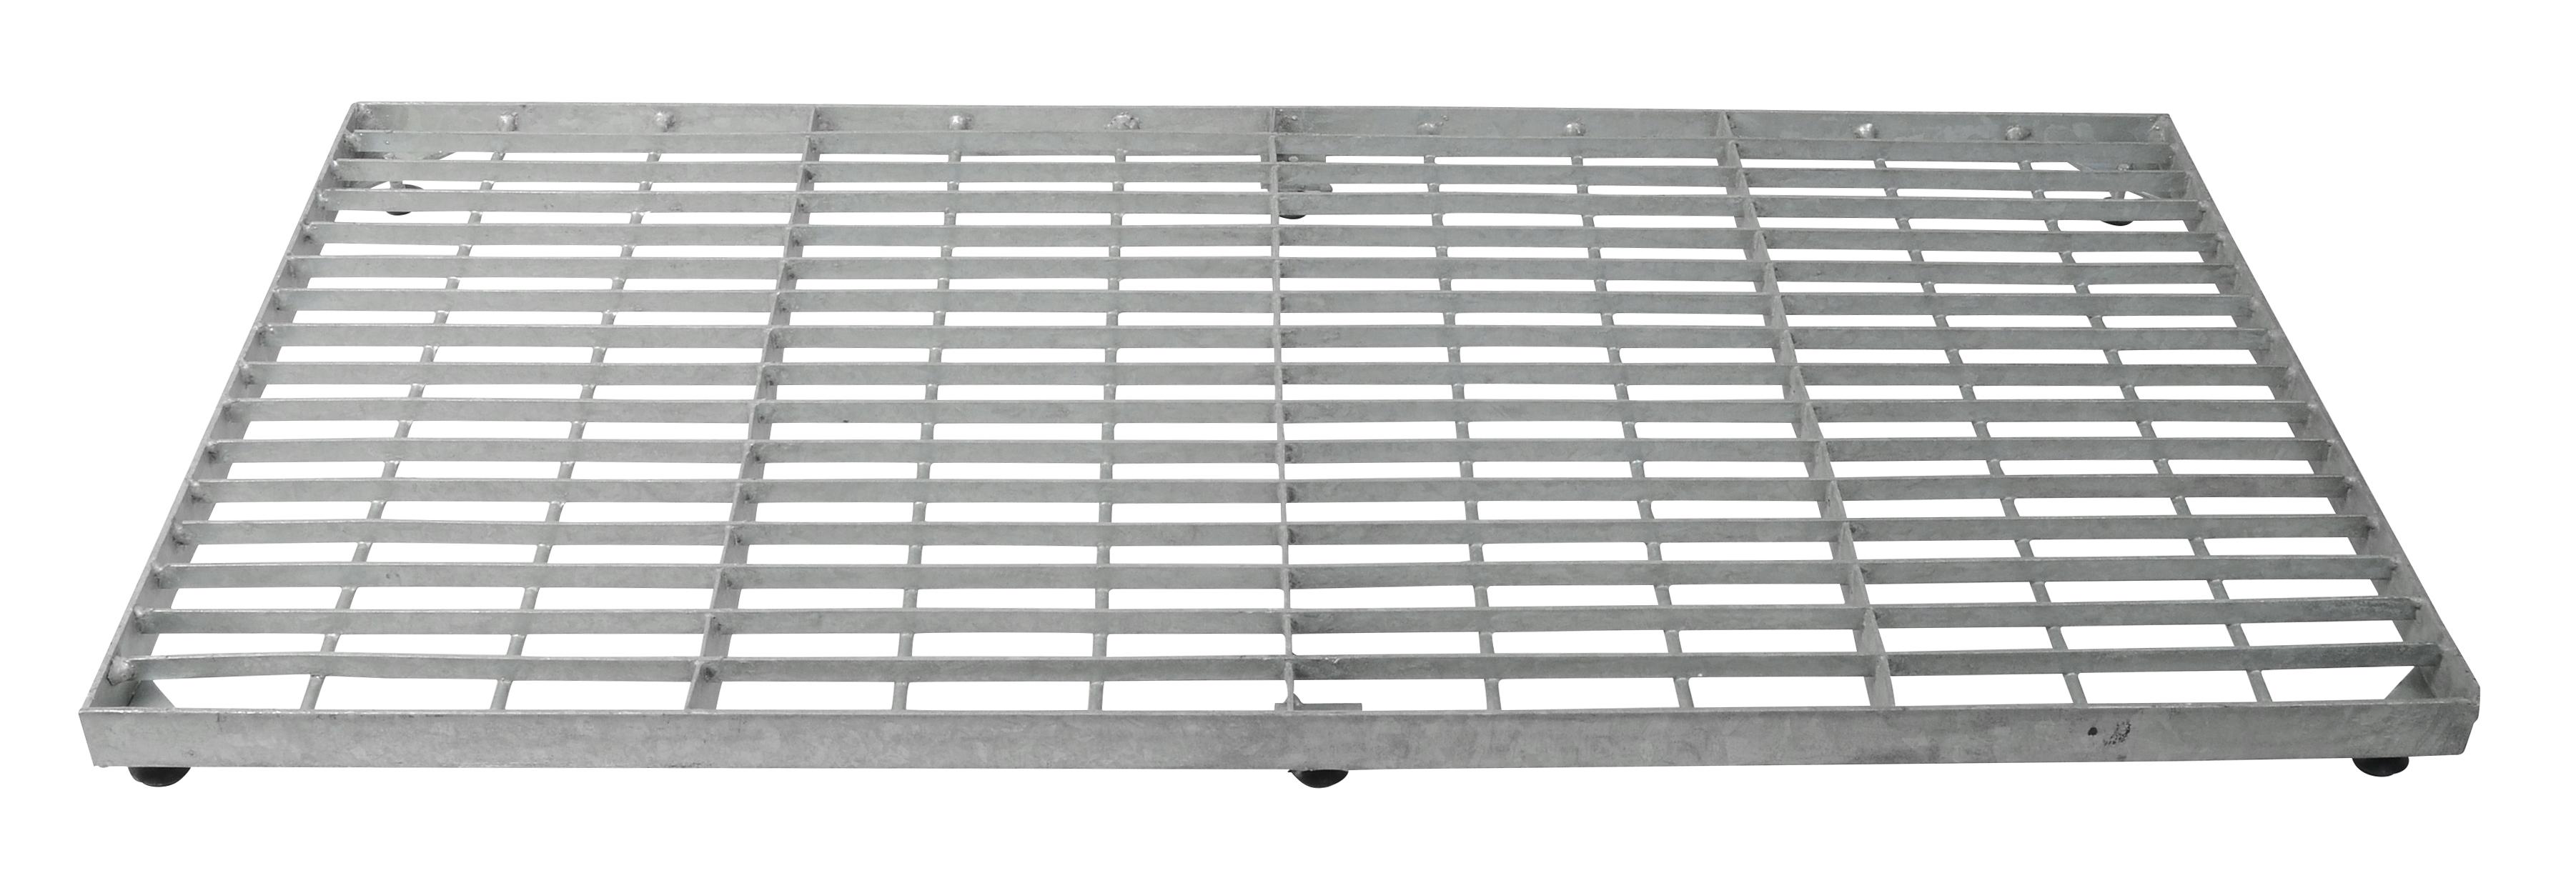 Trinrist firkantet 40x80 cm- galvaniseret